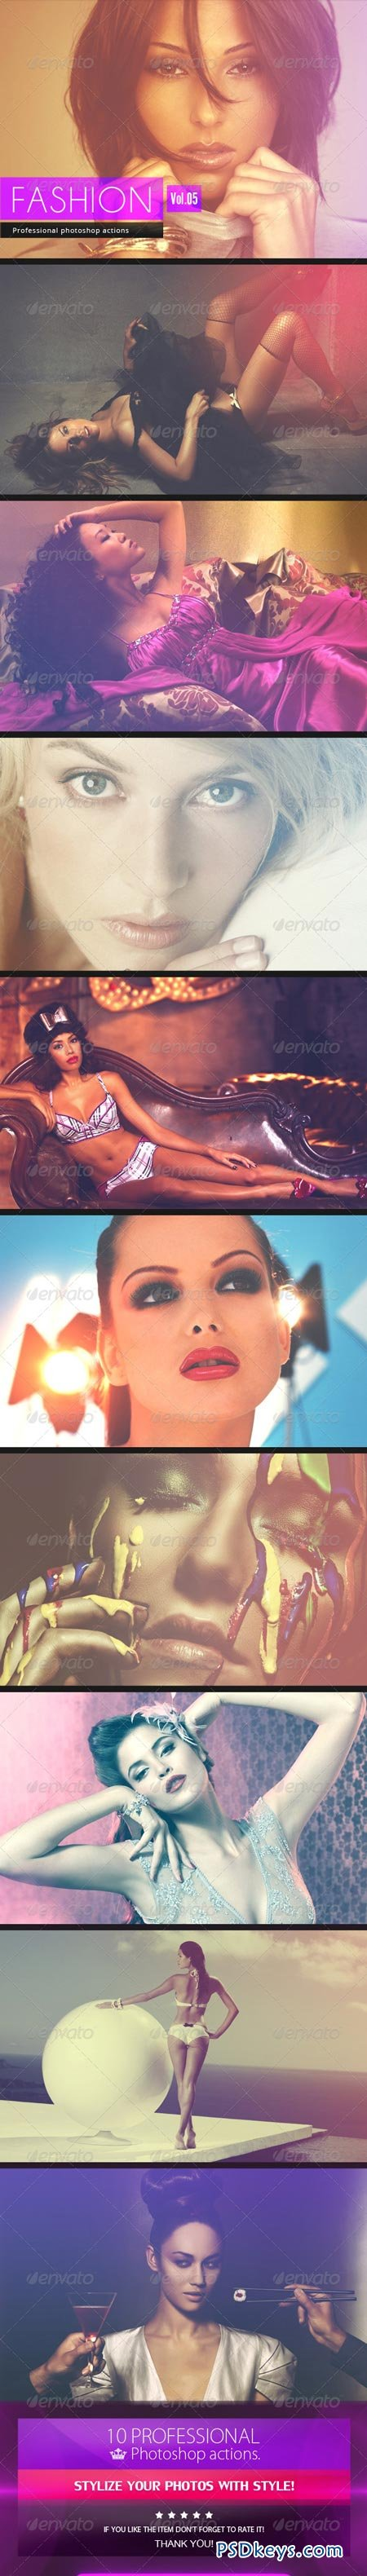 Fashion - Photoshop Actions [Vol.5] 7651571